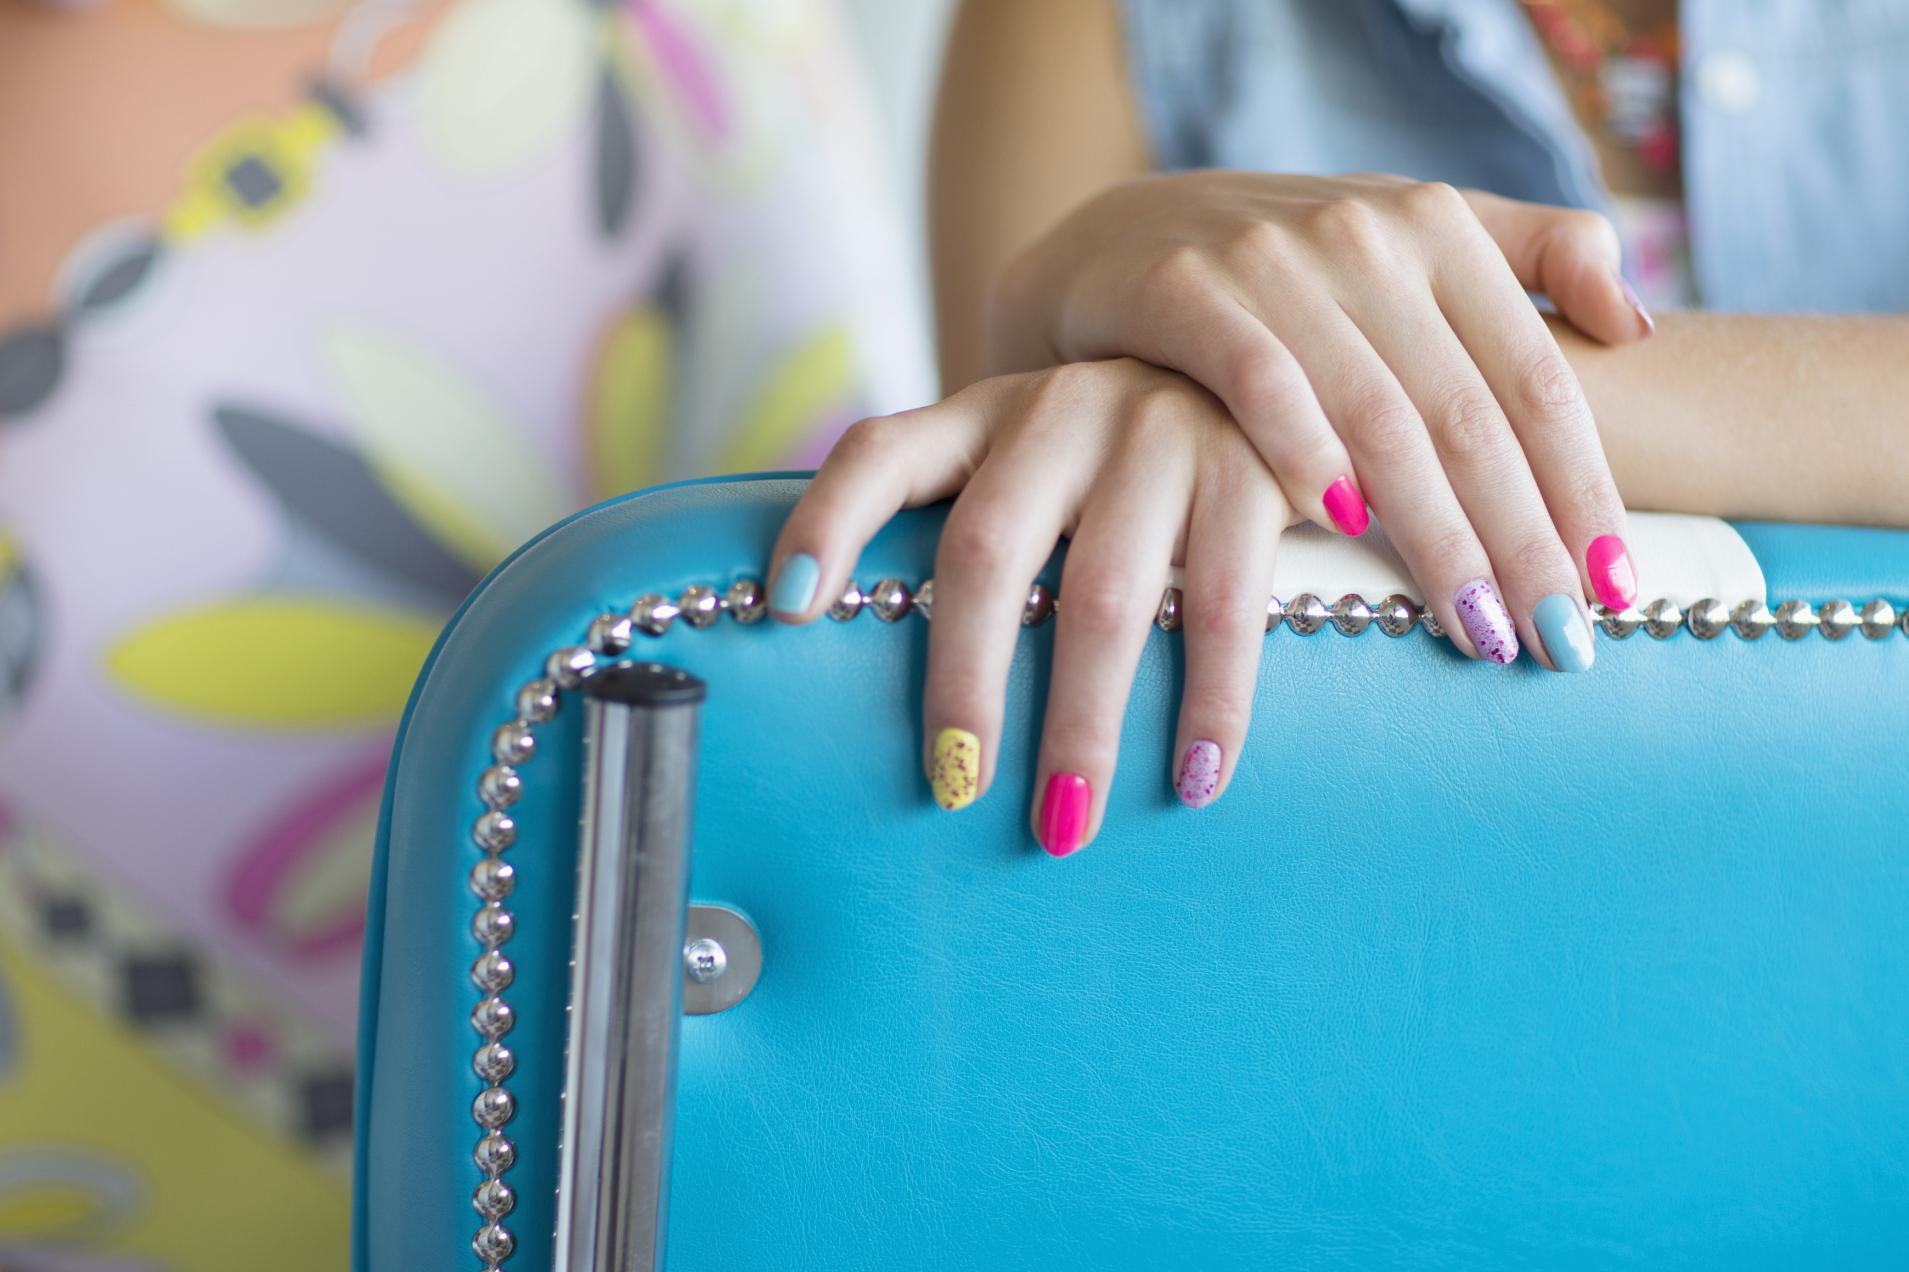 Spray On Nail Polish Will Make Your Perfect Manicure Dreams Come True Sheknows